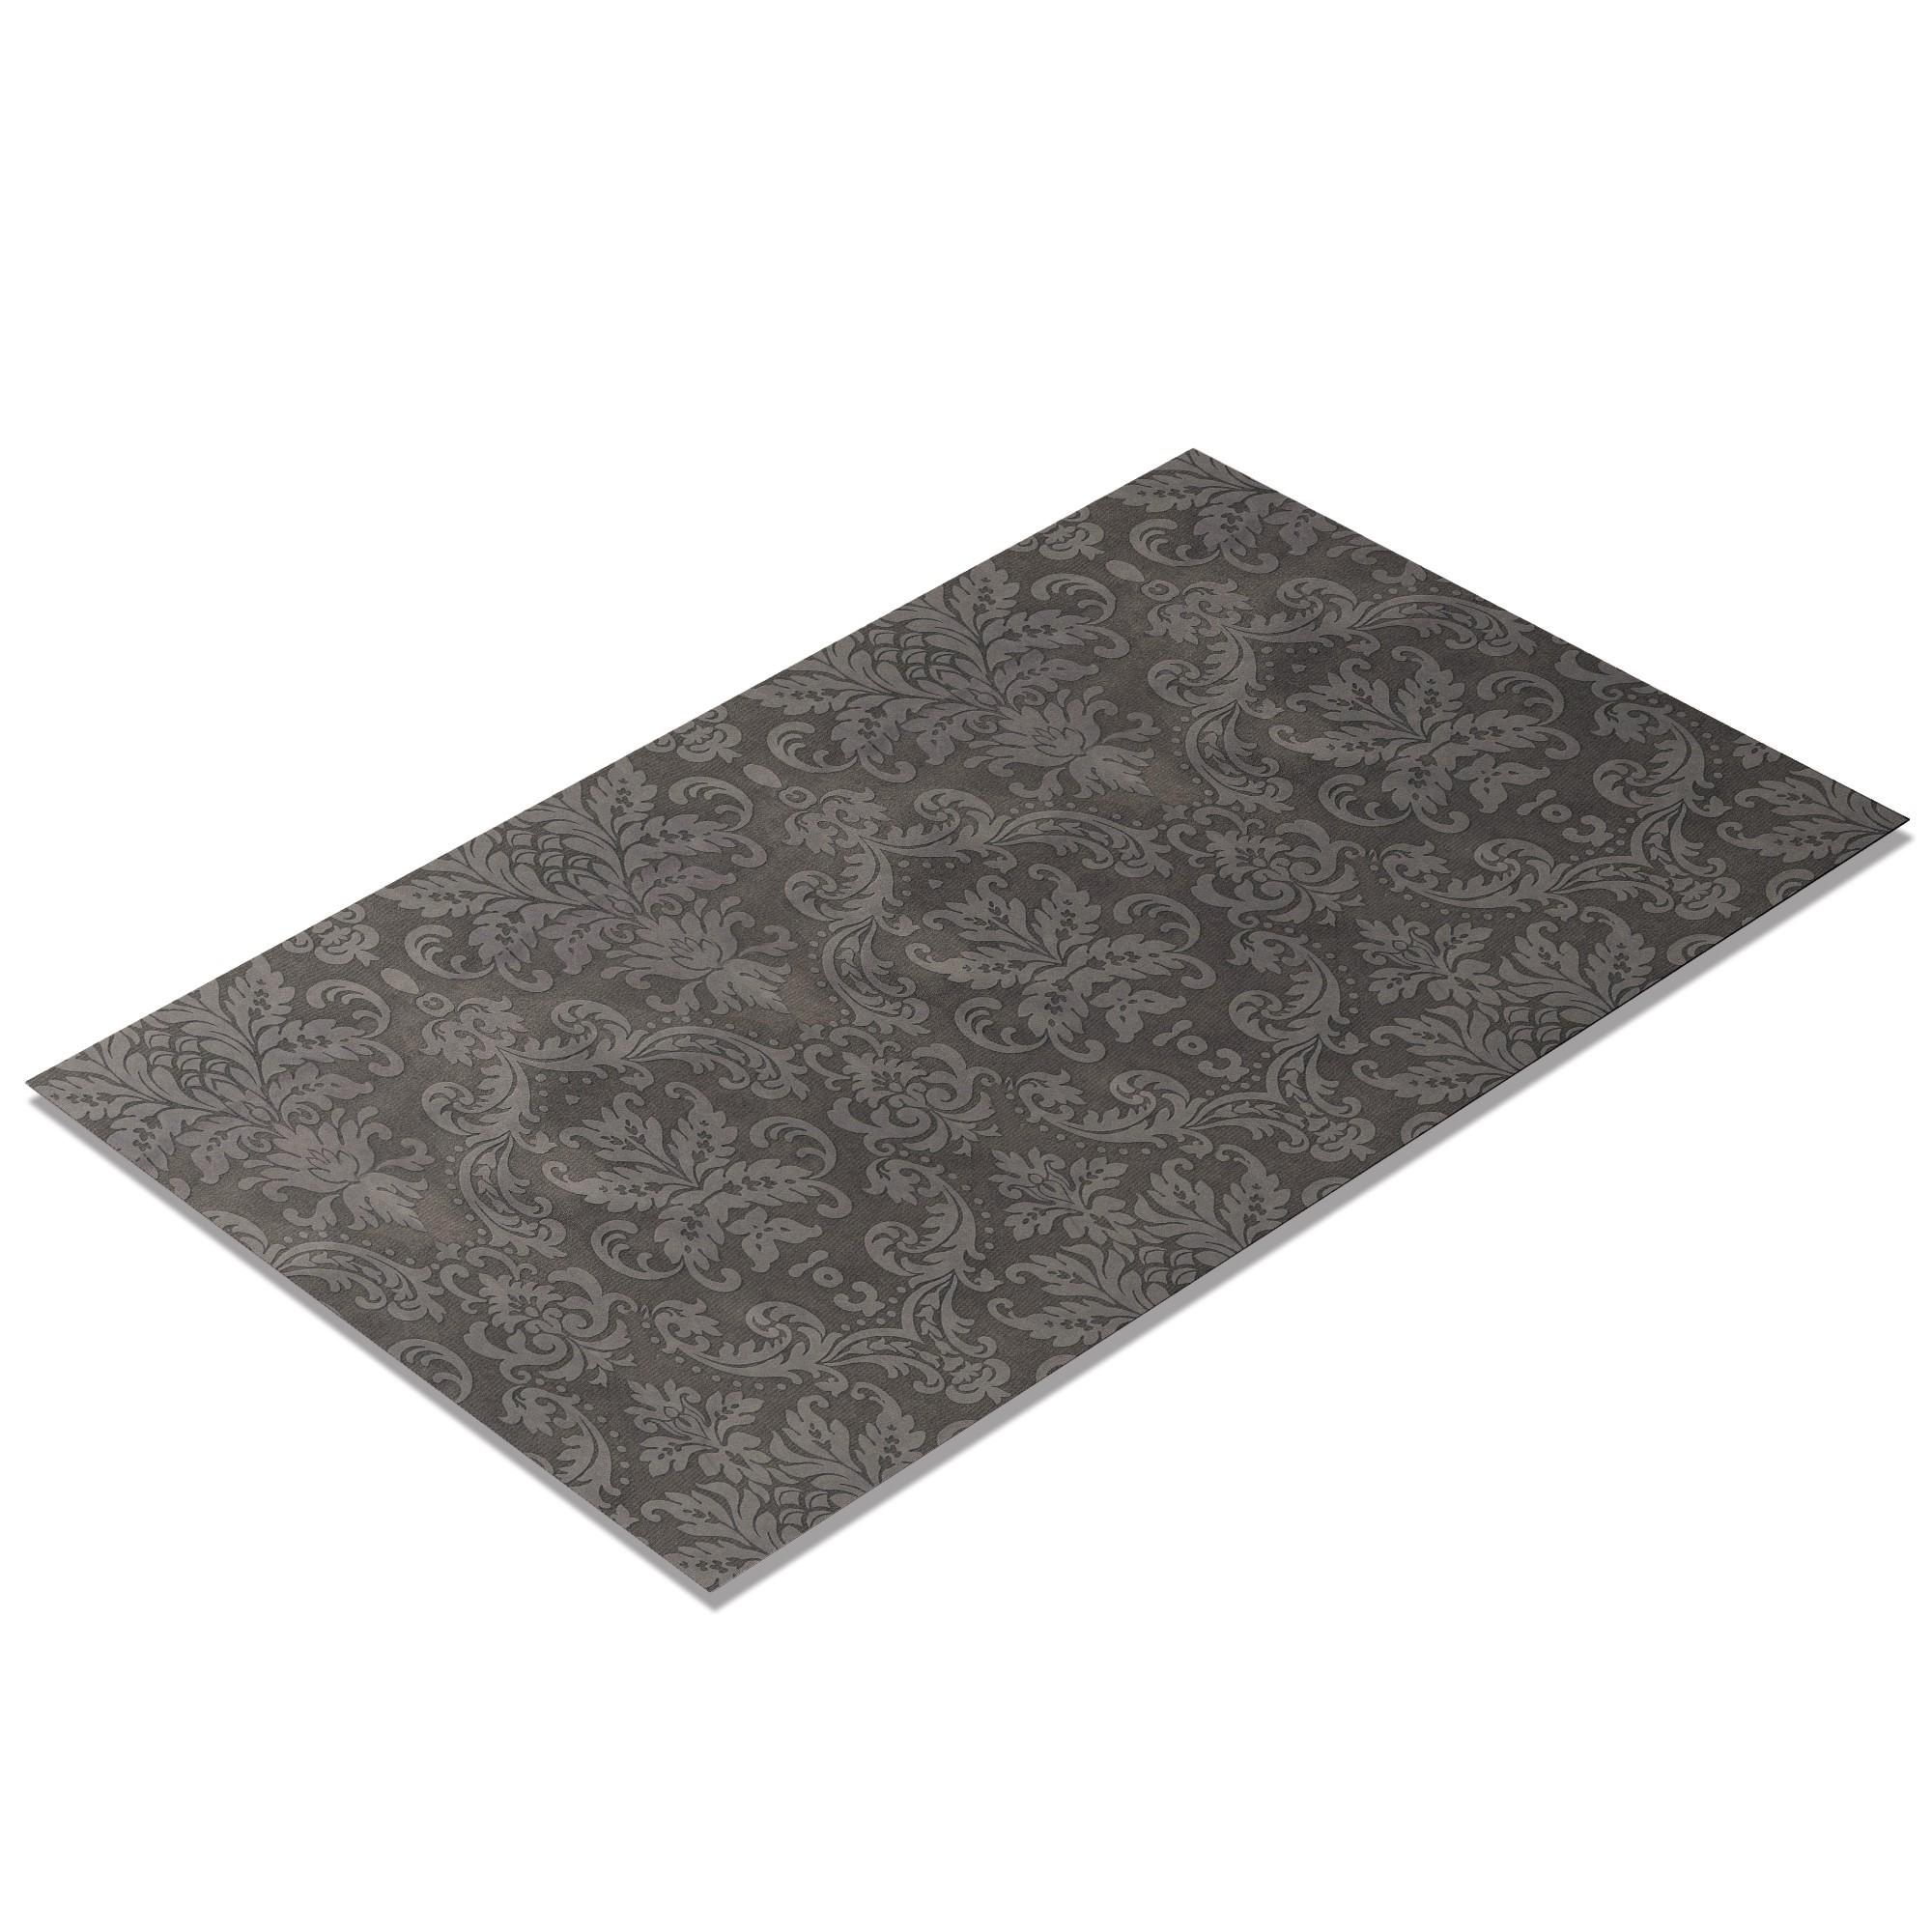 orientalische stoffe damask meterware 24. Black Bedroom Furniture Sets. Home Design Ideas